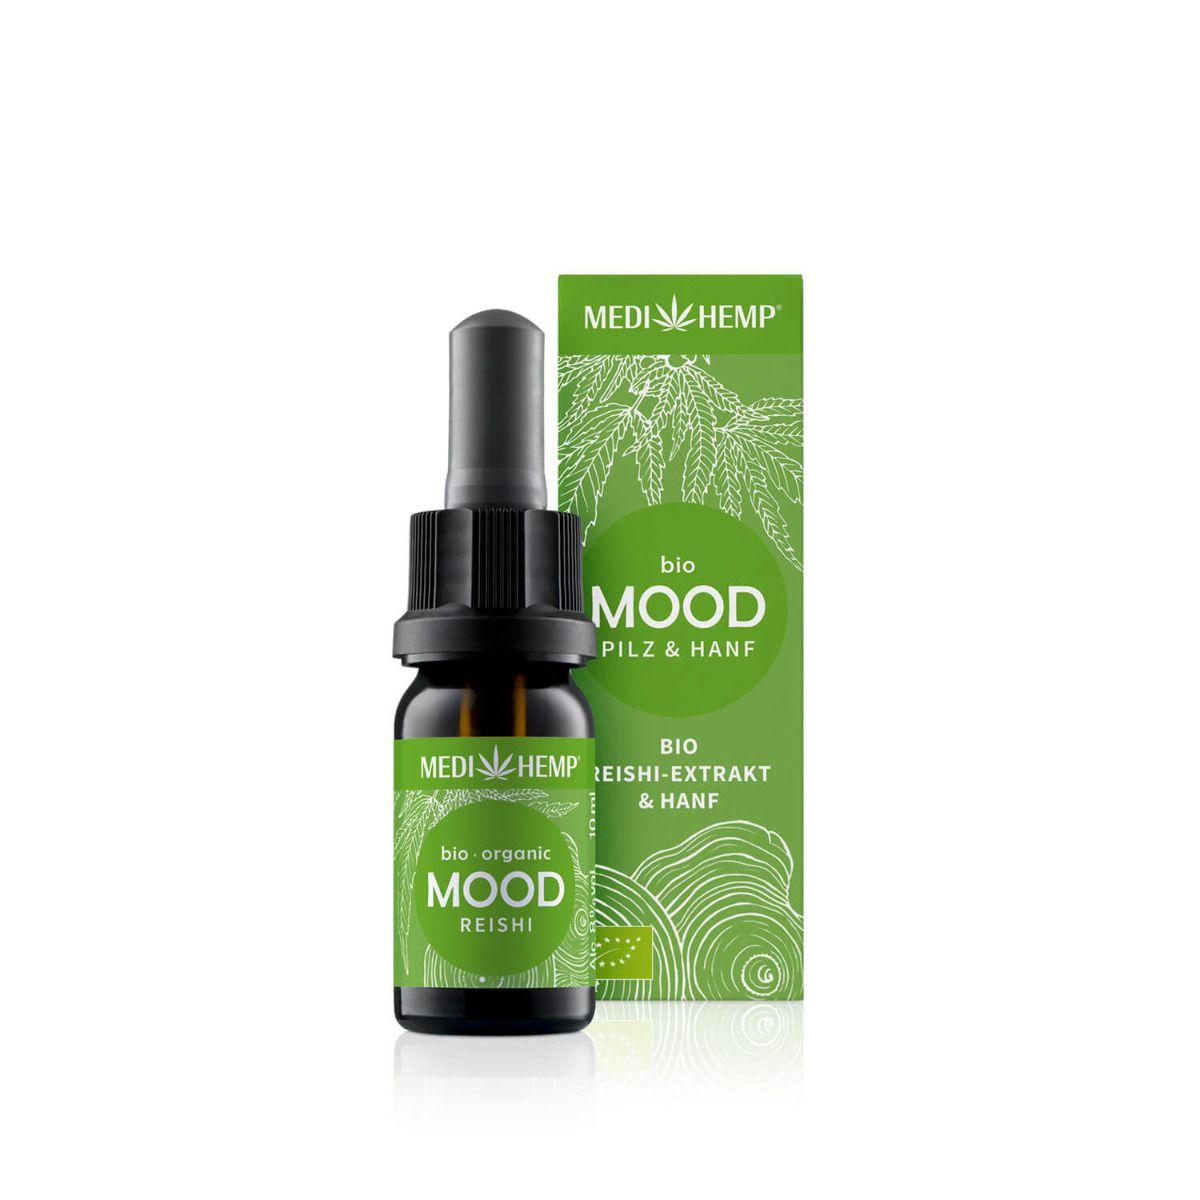 Bio MOOD Reishi-Extrakt & Hanf, Tropfen, vegan